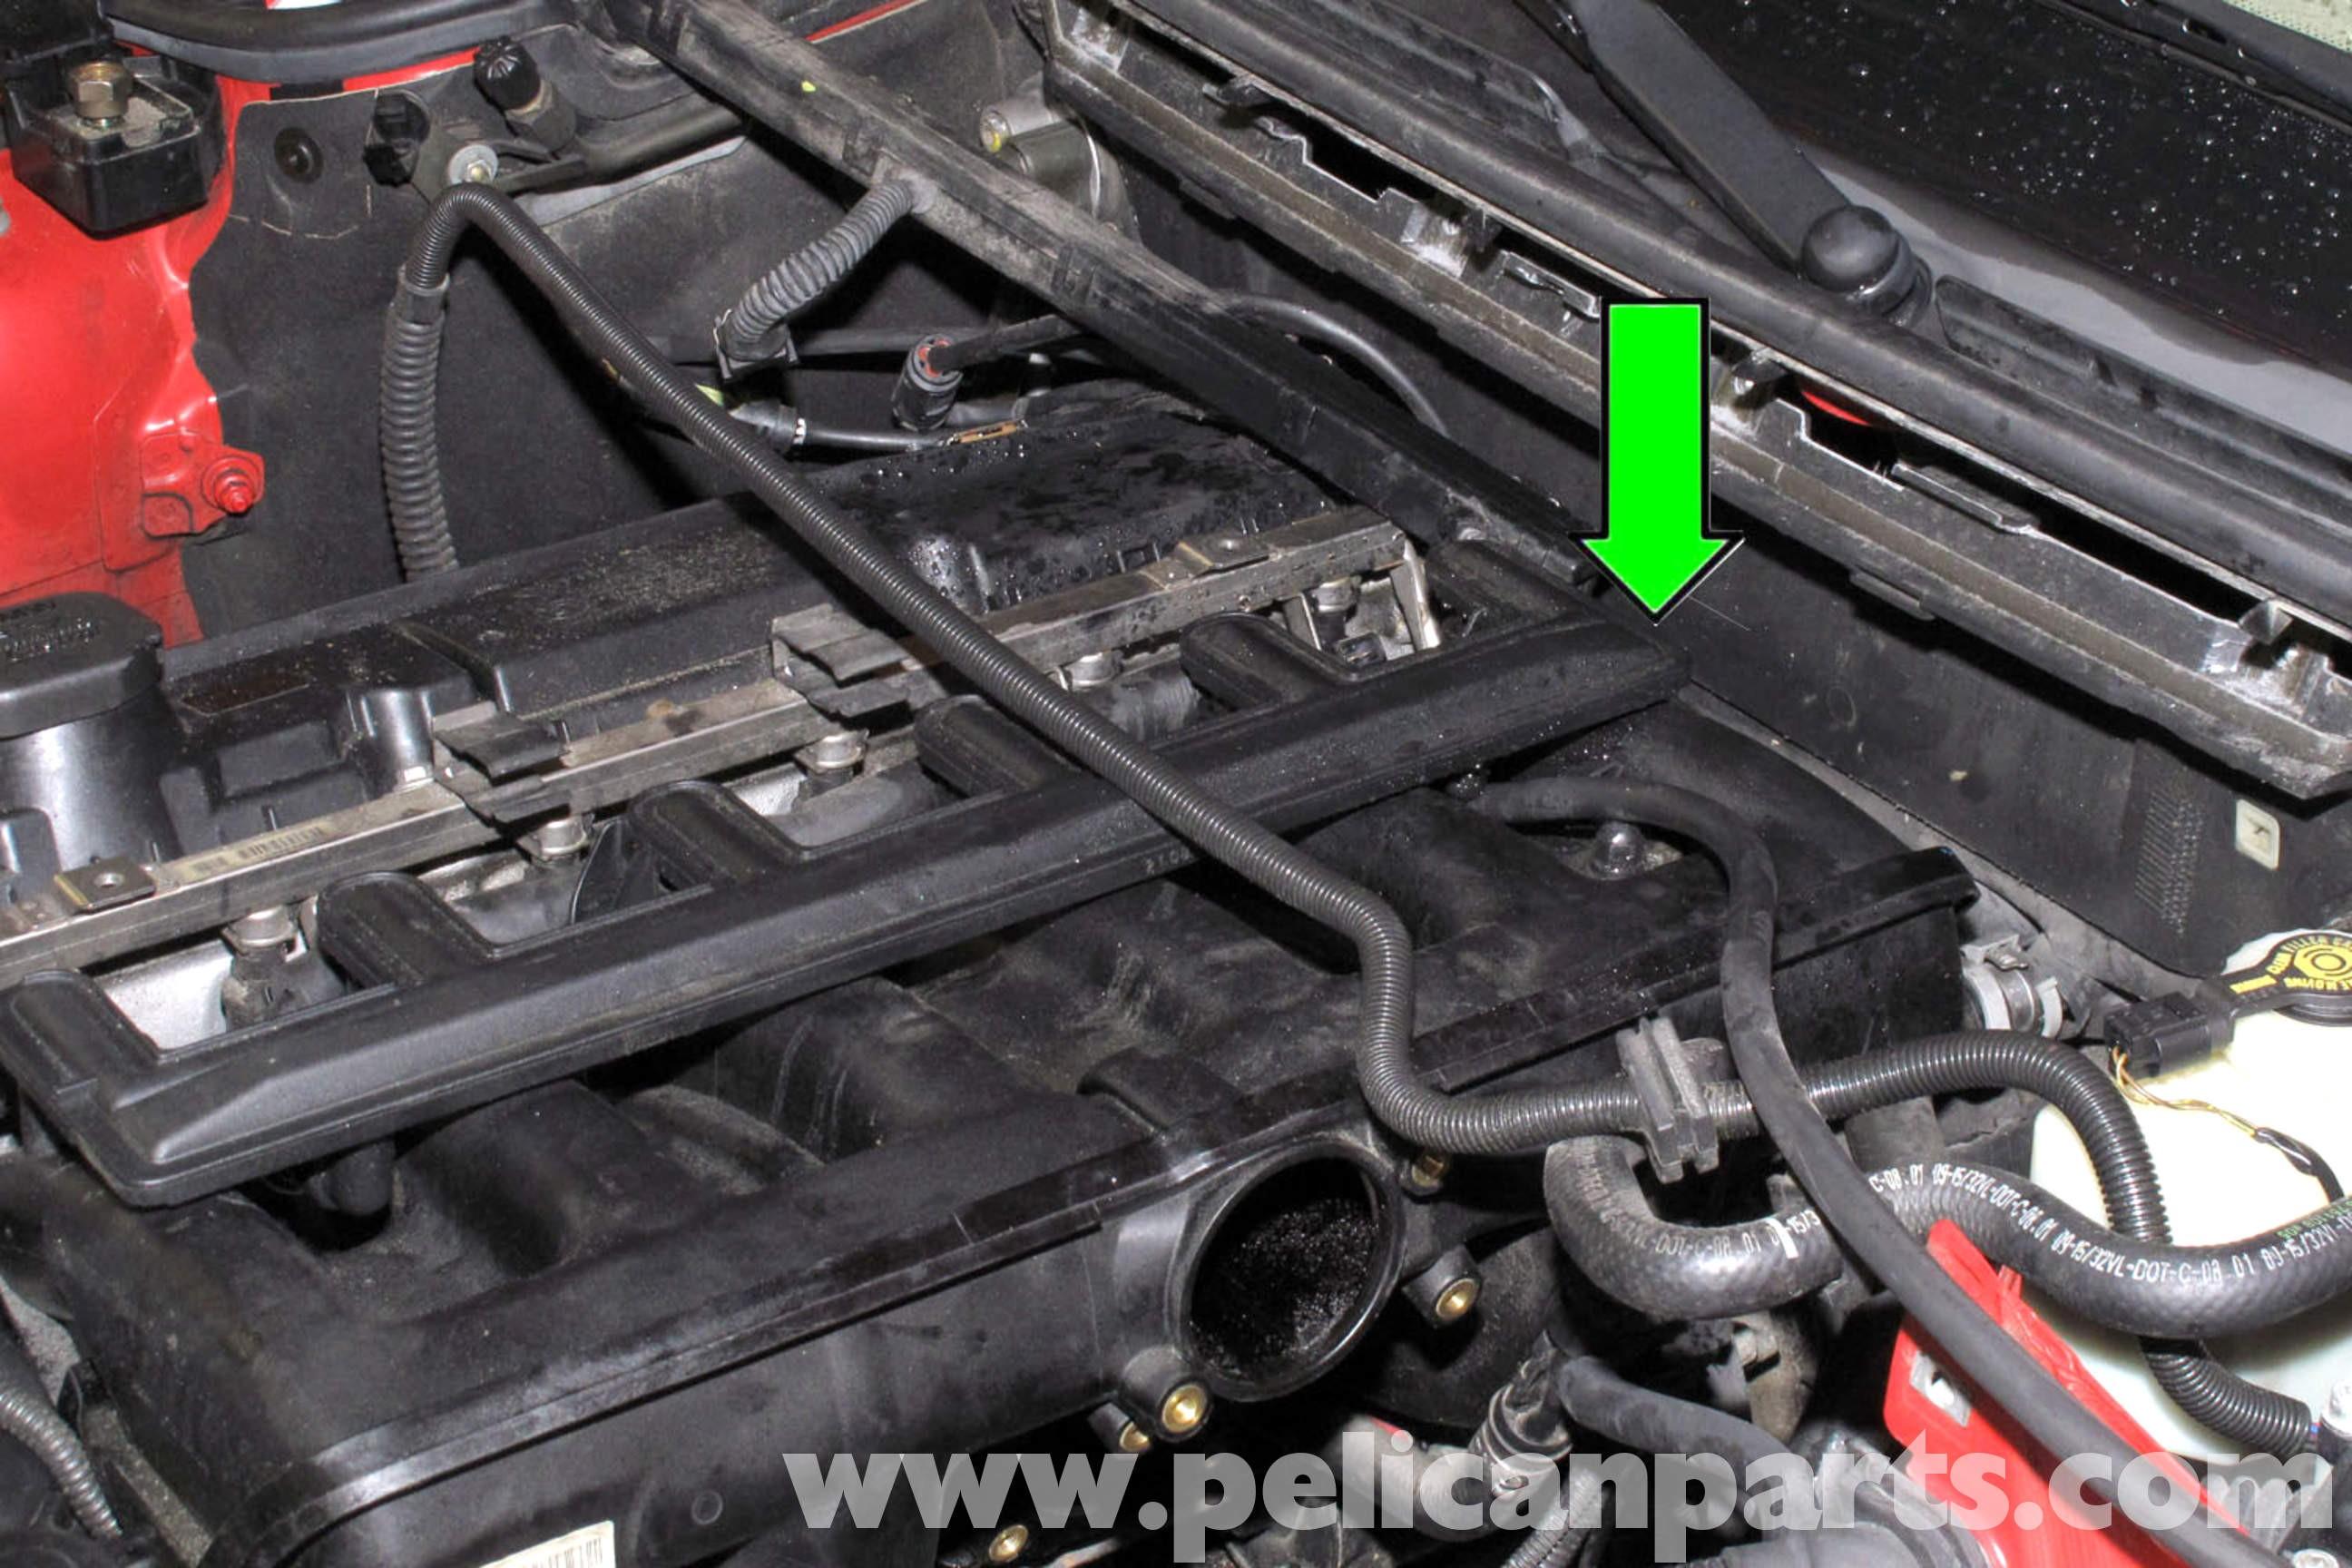 2001 bmw 330i engine diagram bmw e46 fuel injector replacement my rh detoxicrecenze com 2004 bmw 330i engine diagram 2006 bmw 330i engine diagram